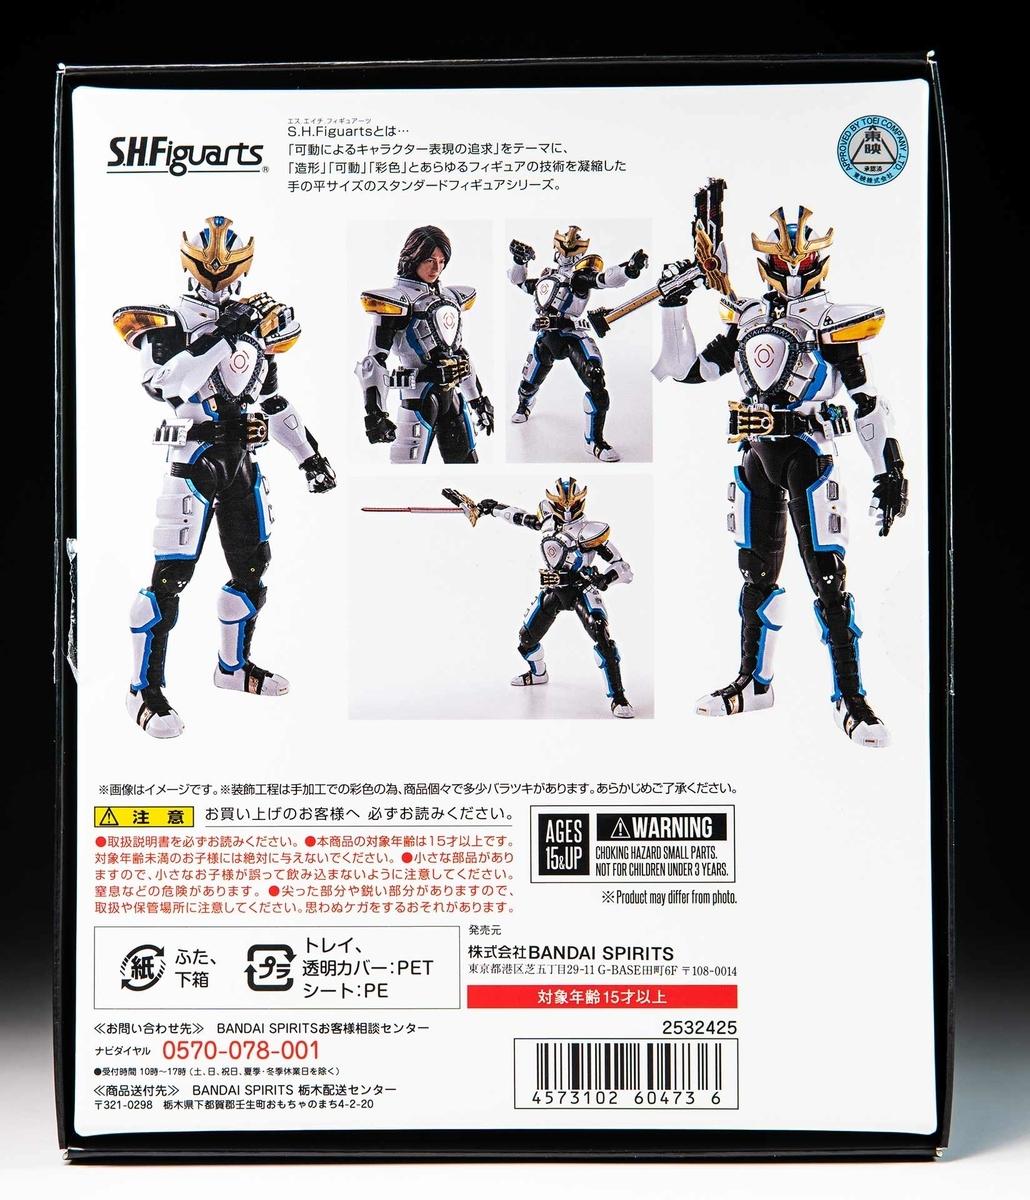 f:id:hiroban-ch:20210718034712j:plain